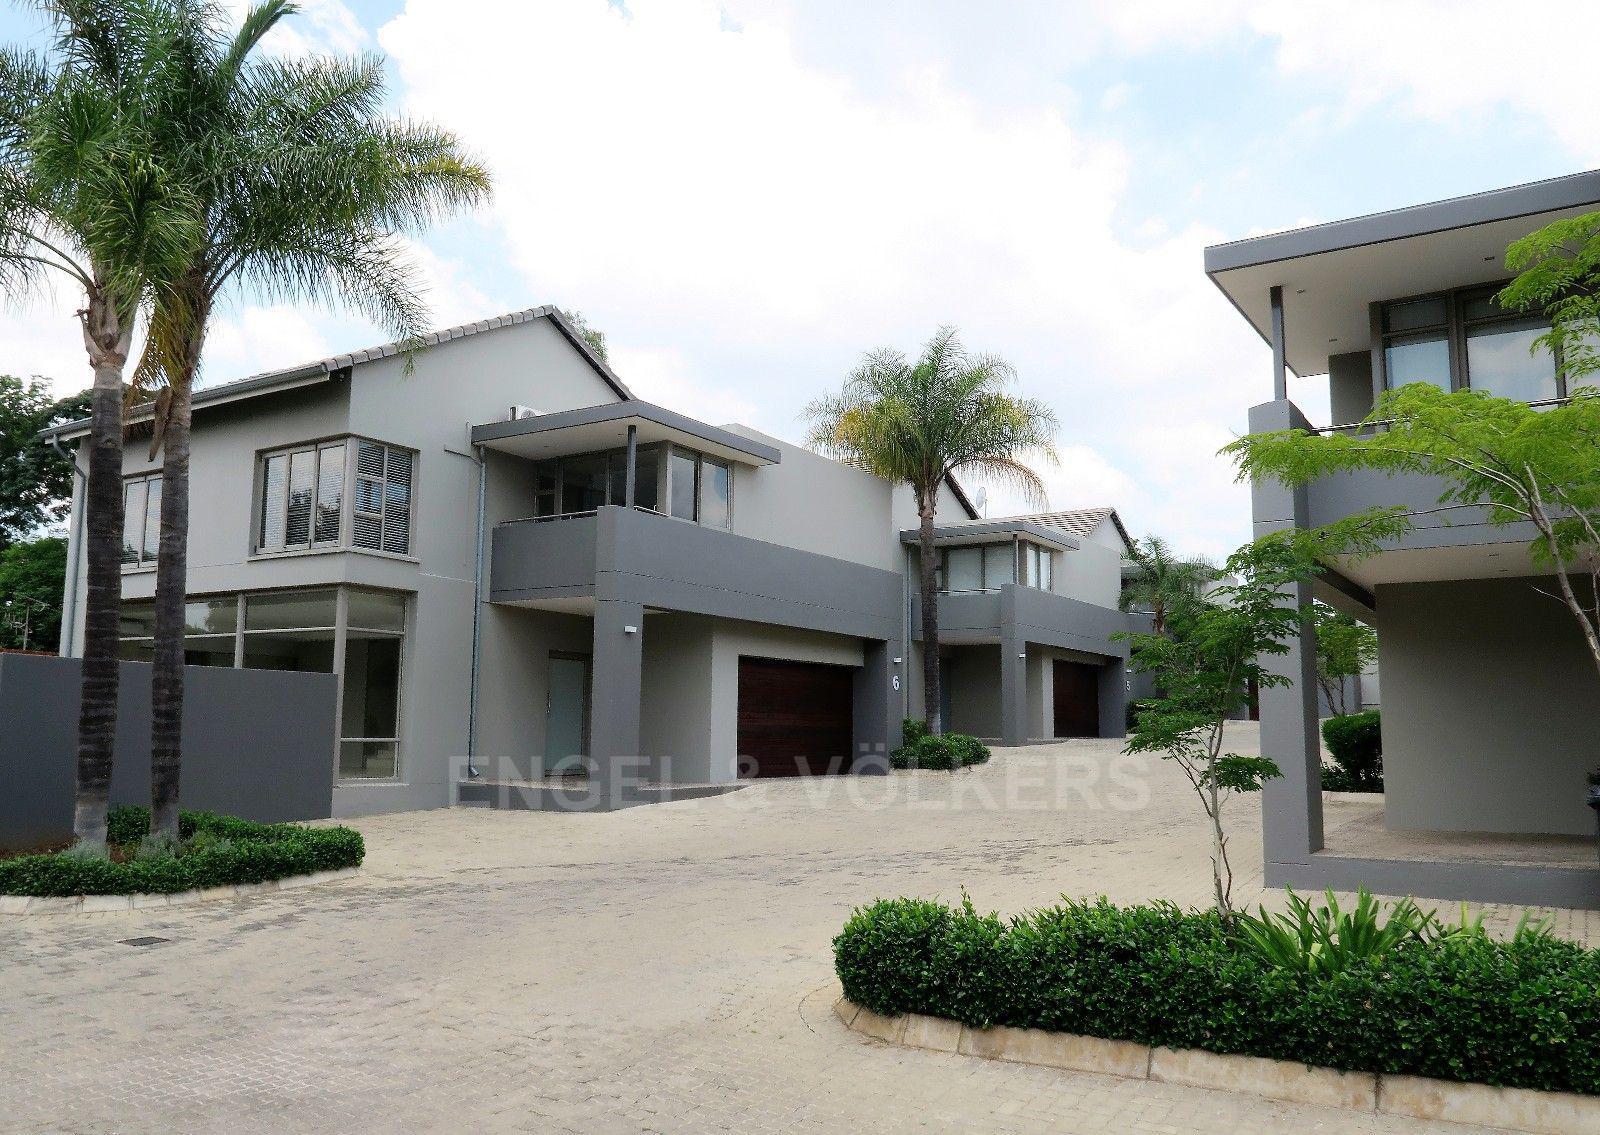 Pretoria, Menlo Park Property  | Houses For Sale Menlo Park, MENLO PARK, Duplex 3 bedrooms property for sale Price:2,850,000